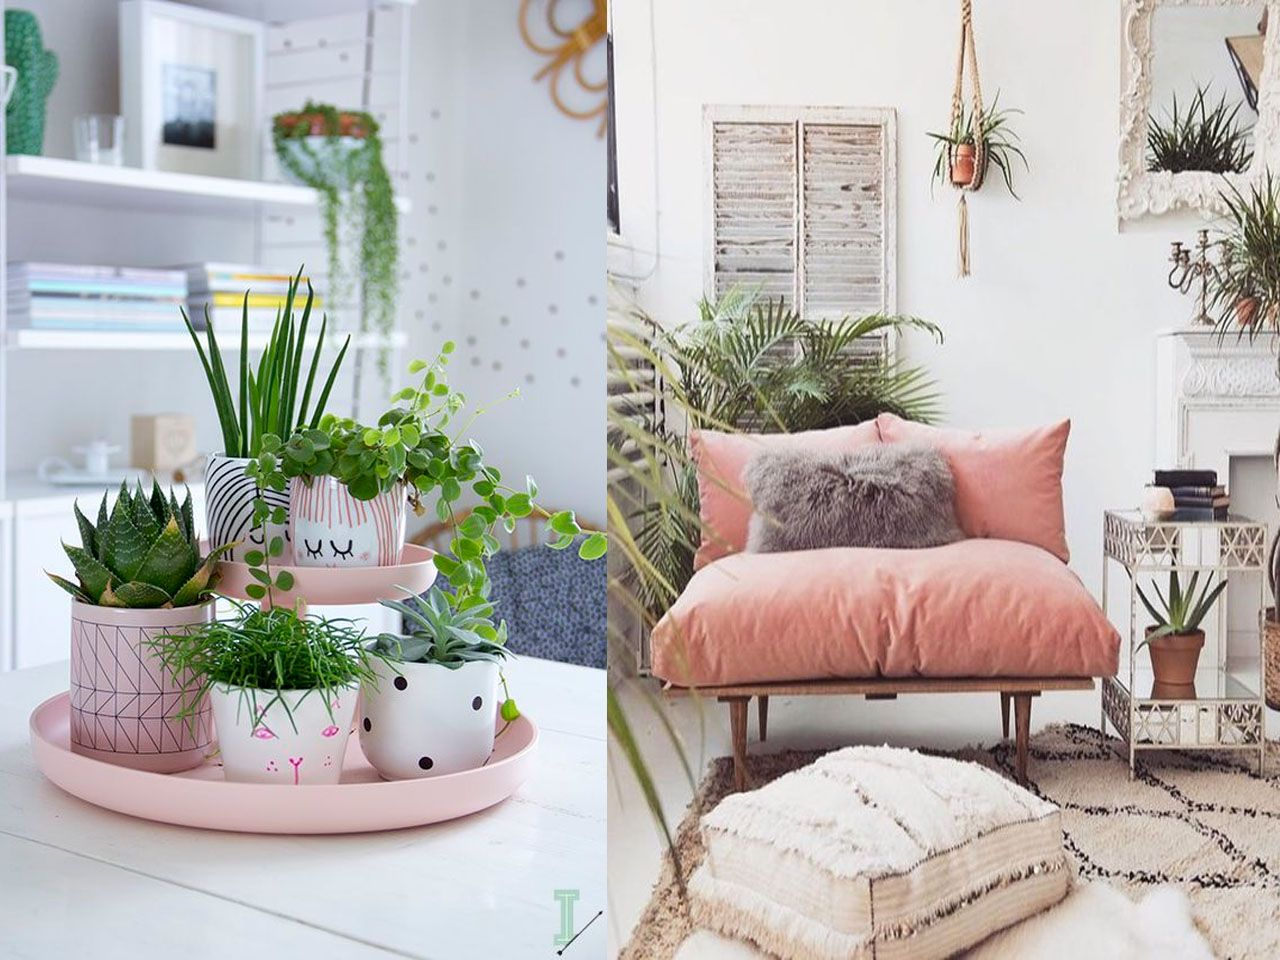 Los complementos decoraci n que m s triunfar n en 2017 - Complementos decoracion salon ...